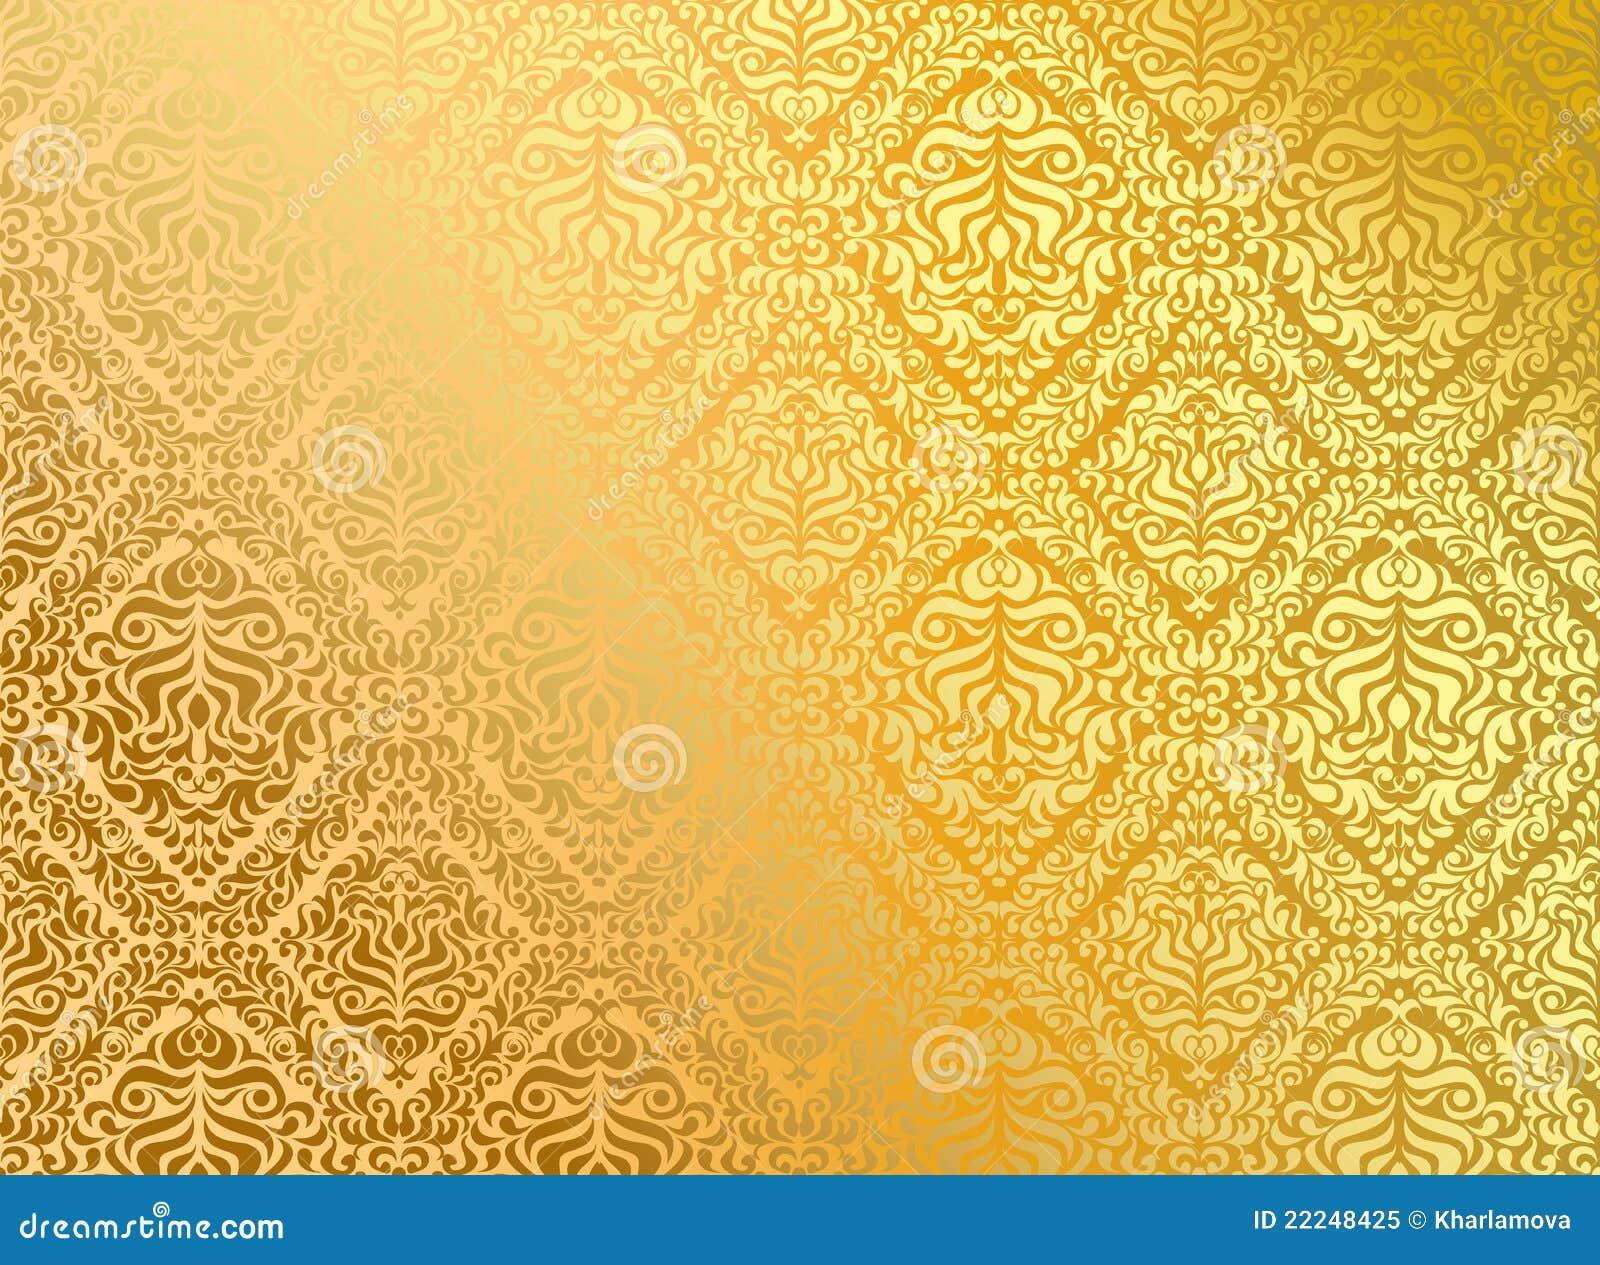 Seamless Wallpaper Gold Stock Vector Illustration Of